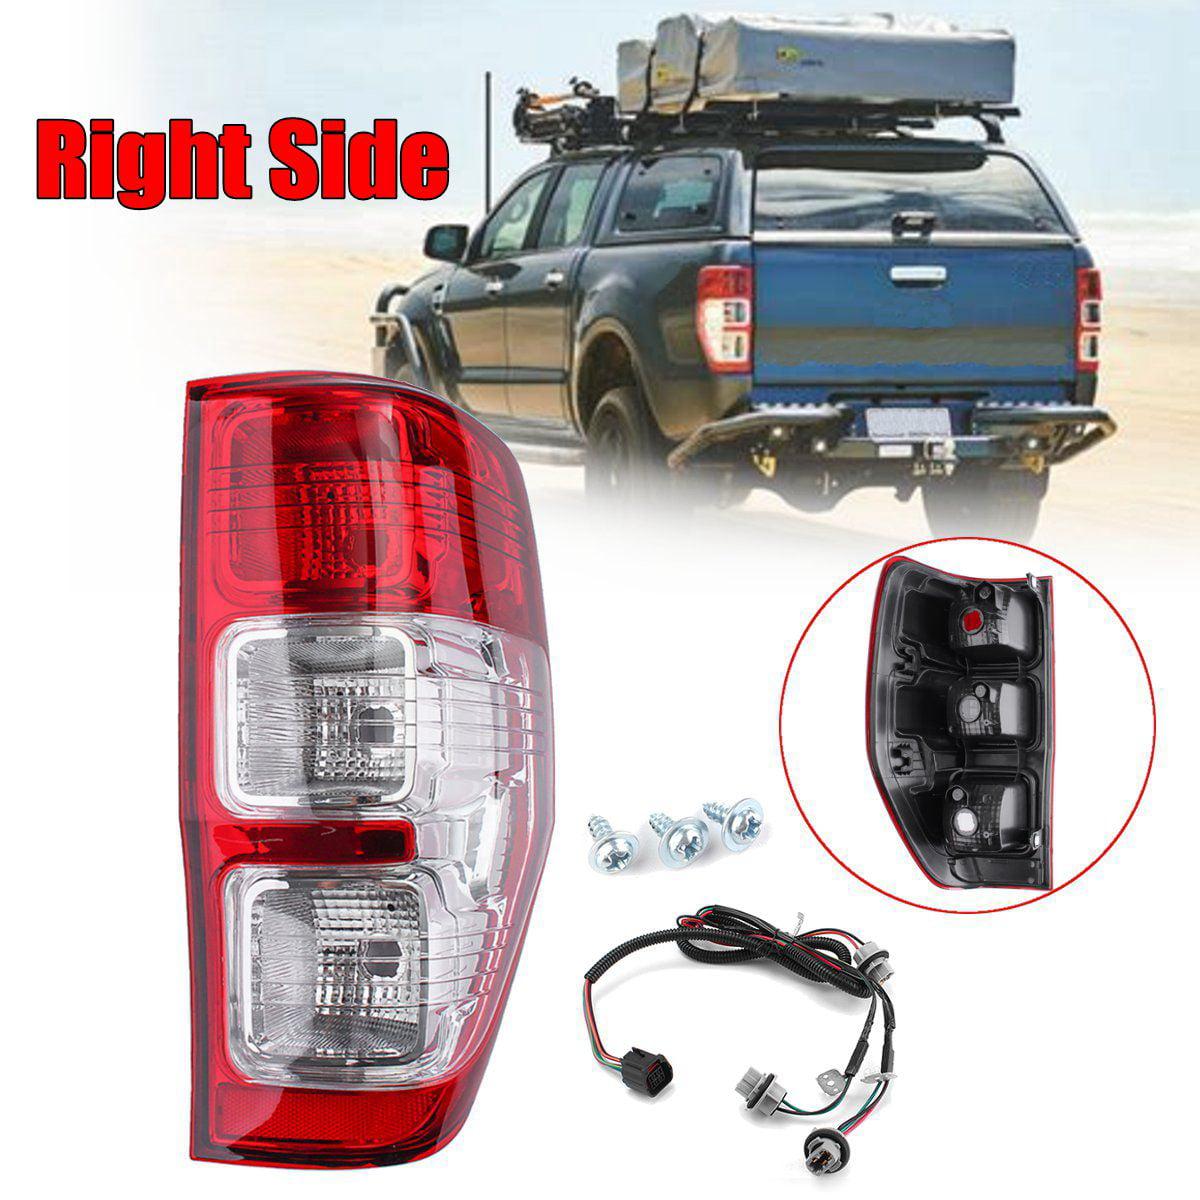 Mountain Bike USB Rechargeable Waterproof Led Light Headlight Taillight B98B 01